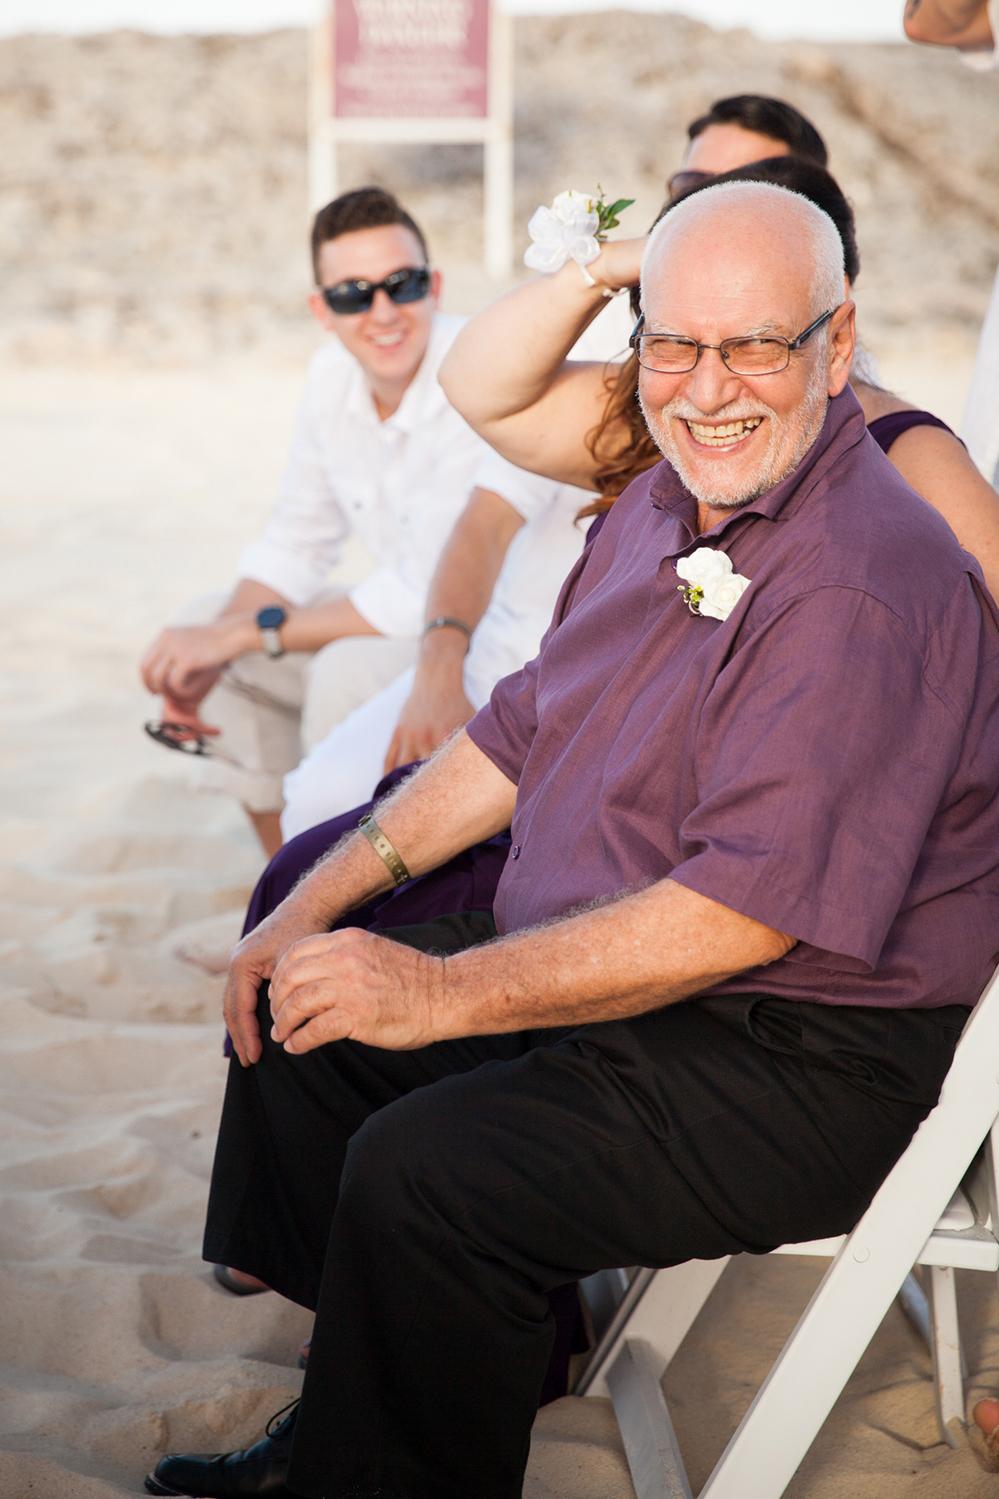 Daniela-Edvard_wedding_Dukat-Photos-1214.jpg